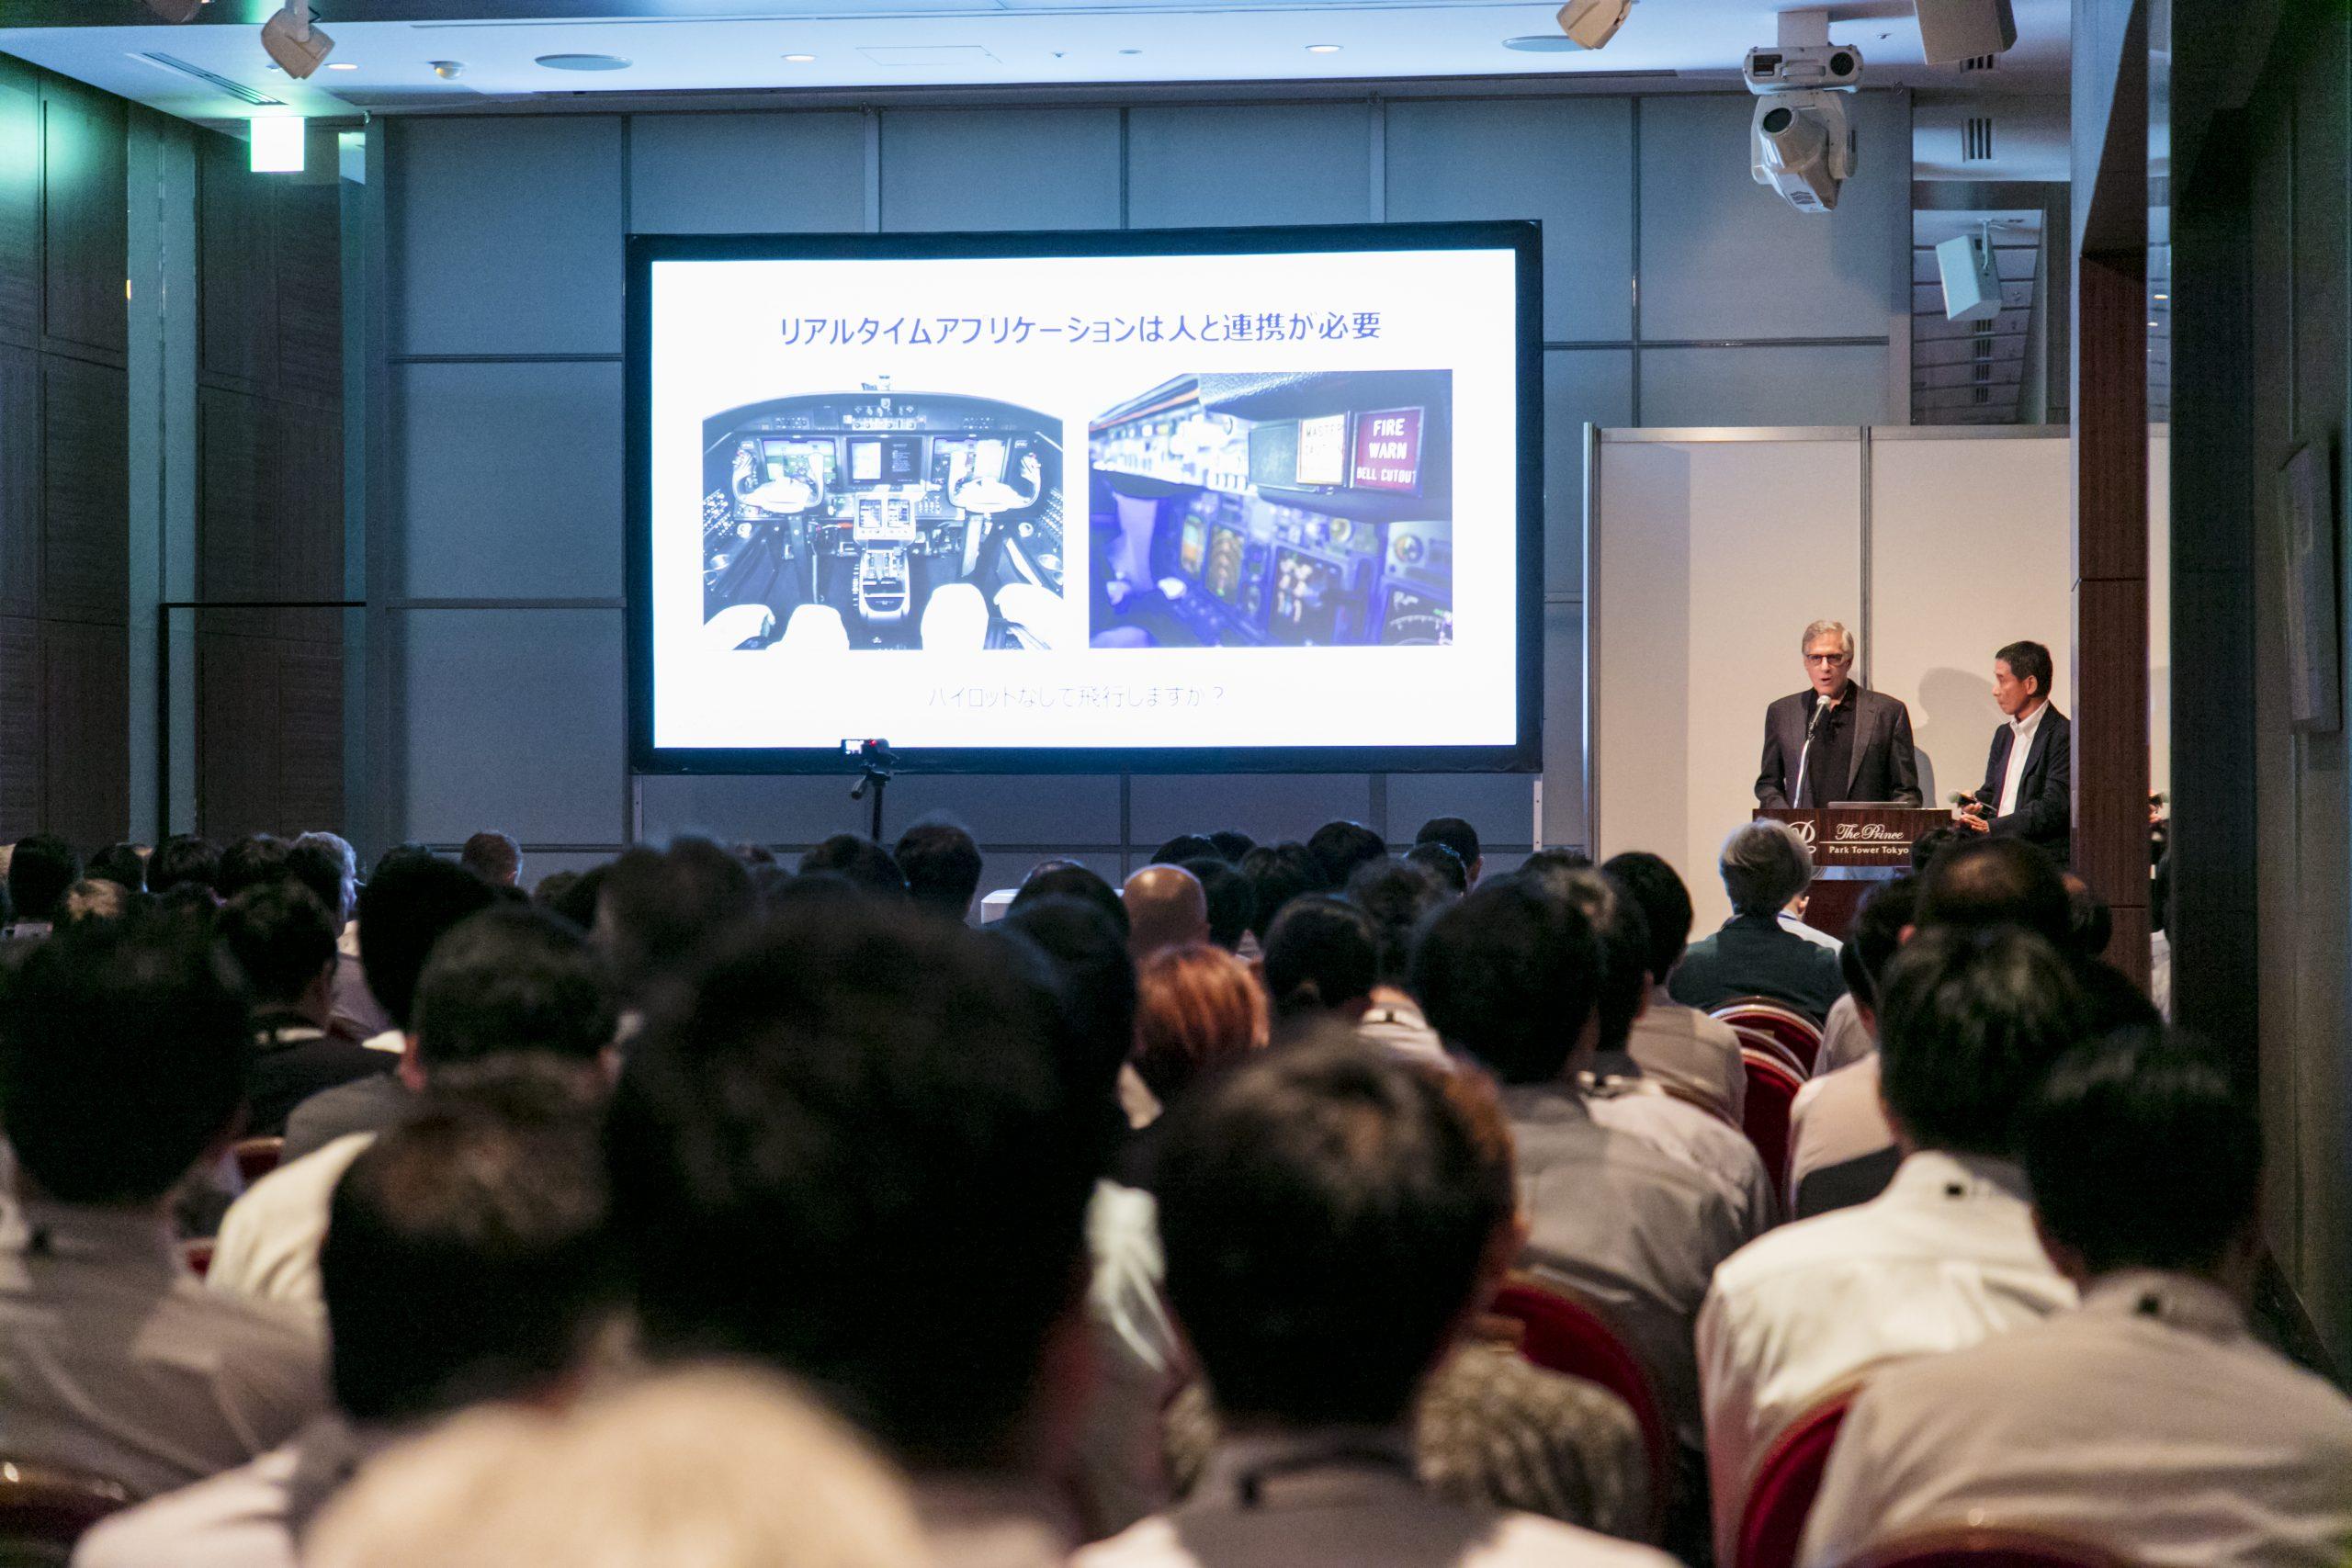 Marty Sprinzen gives keynote at SoftBank World 2019